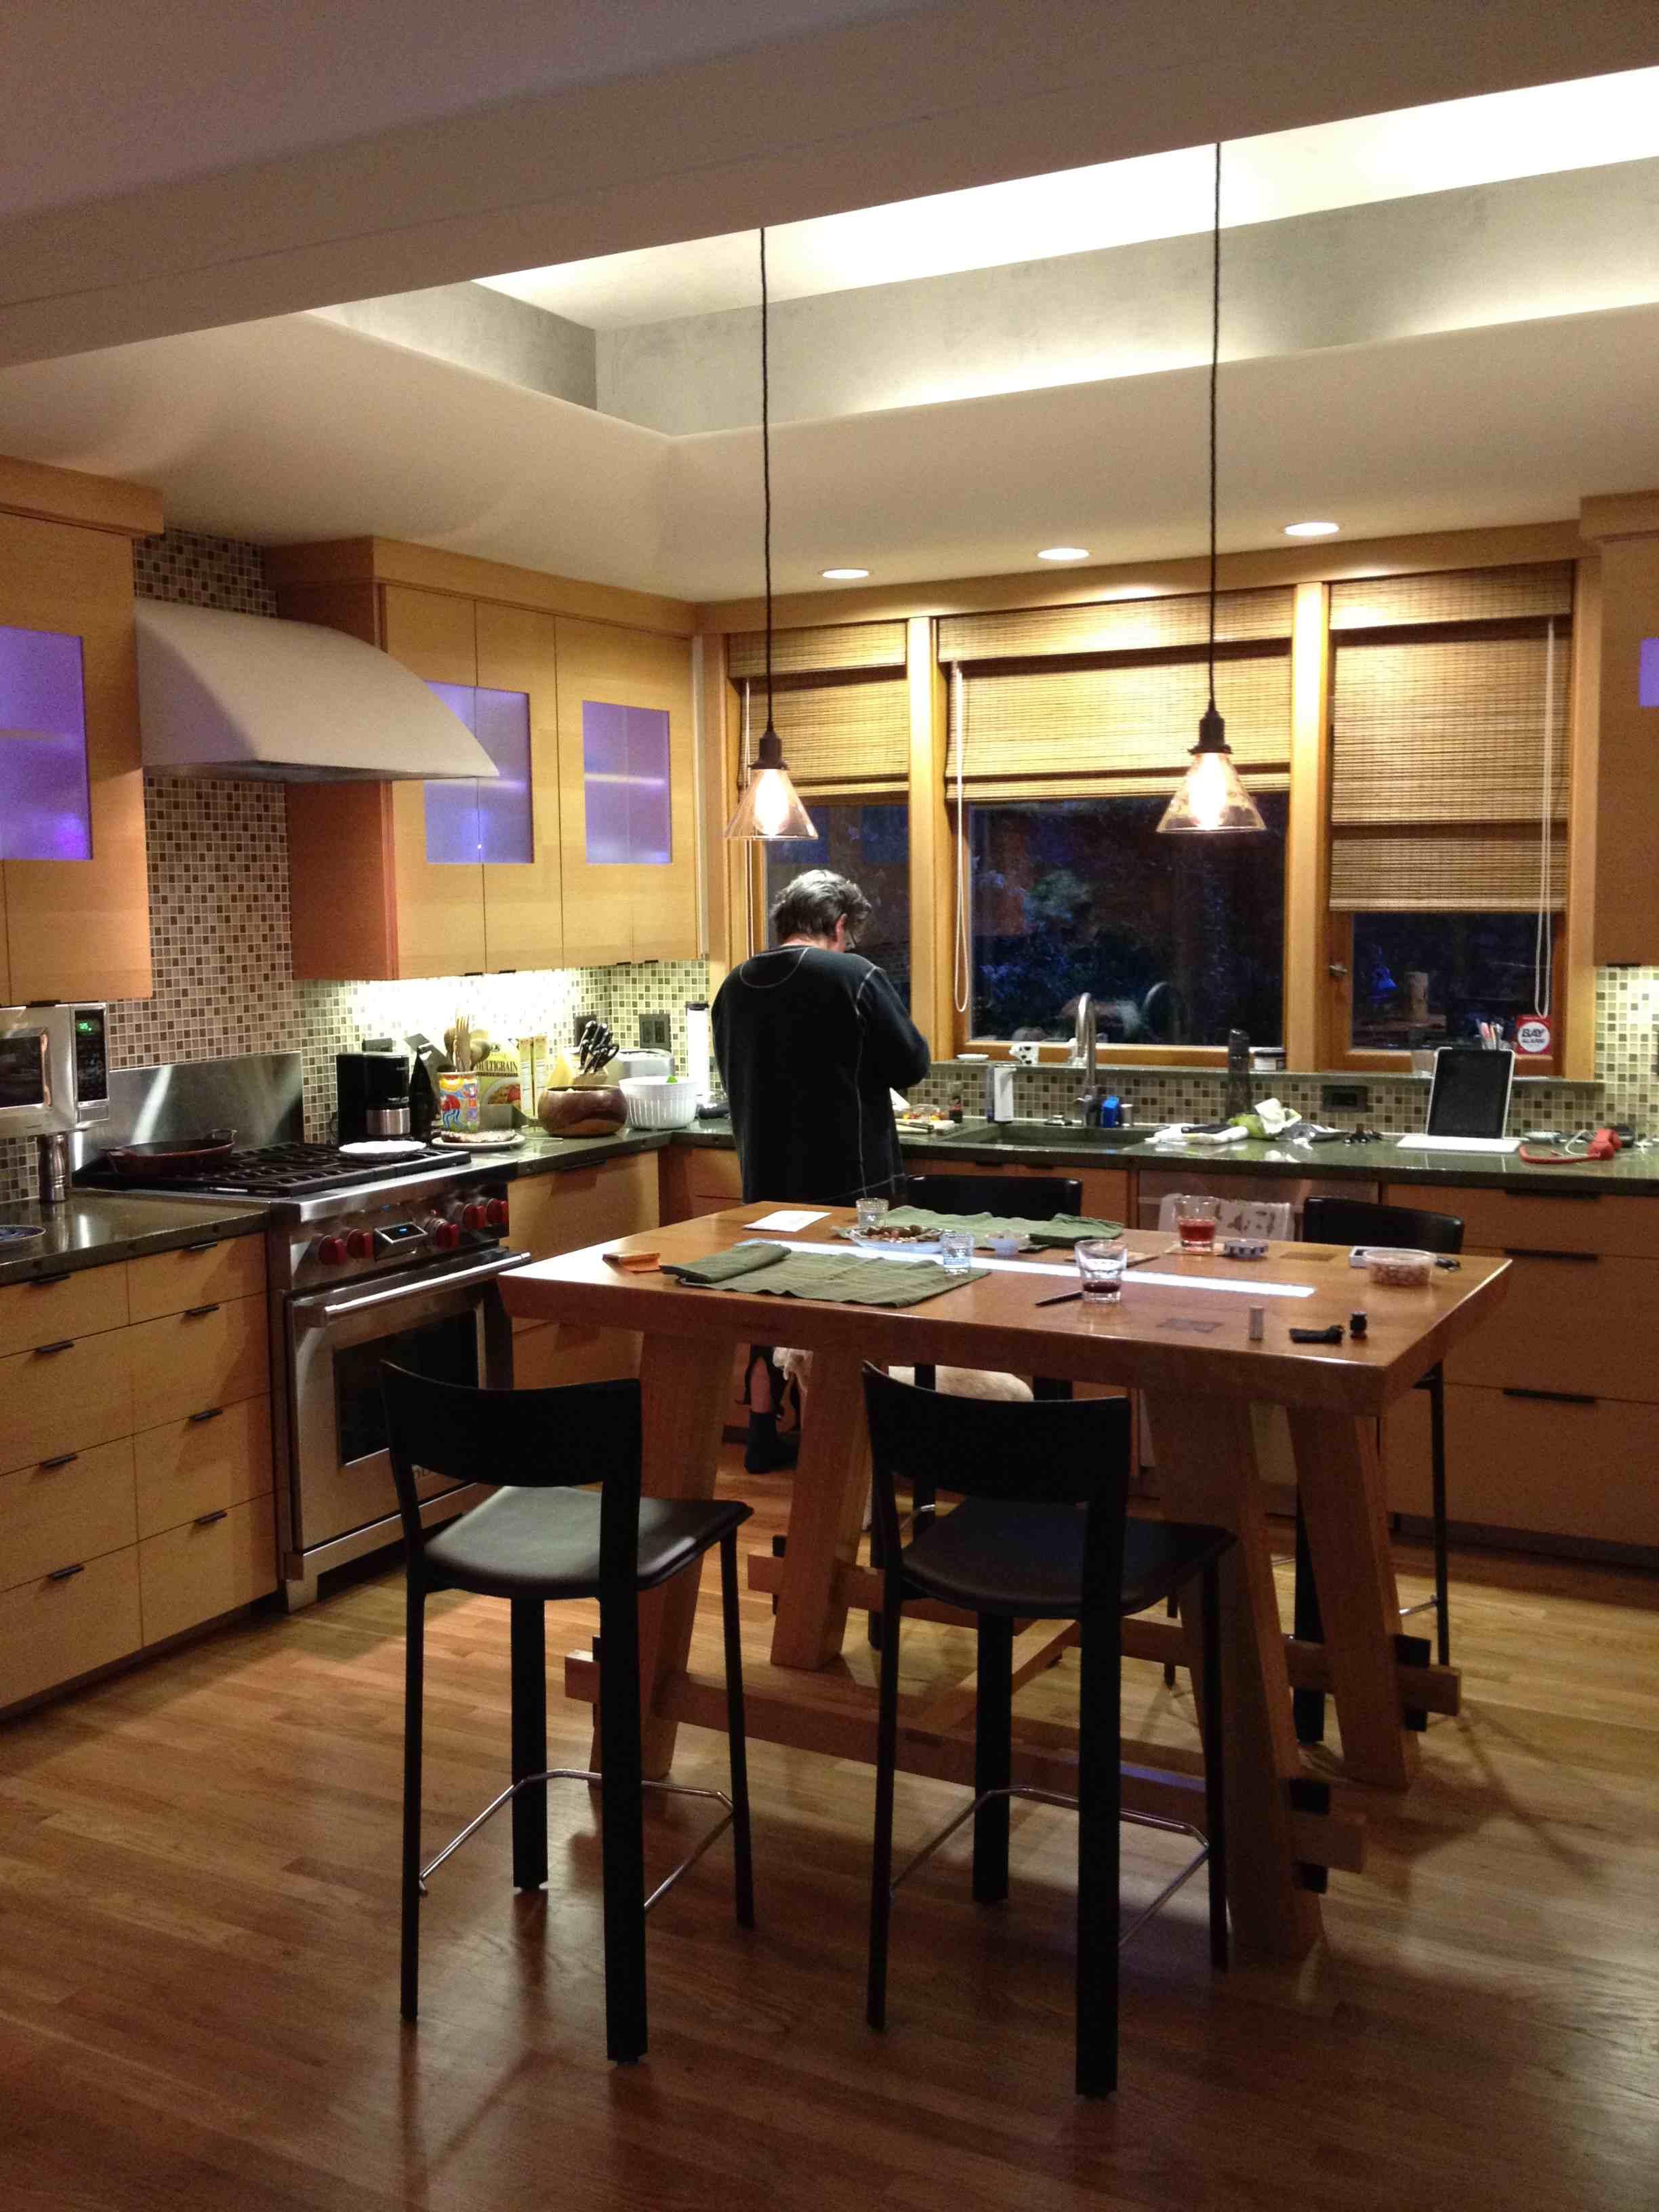 island kitchen small.jpg